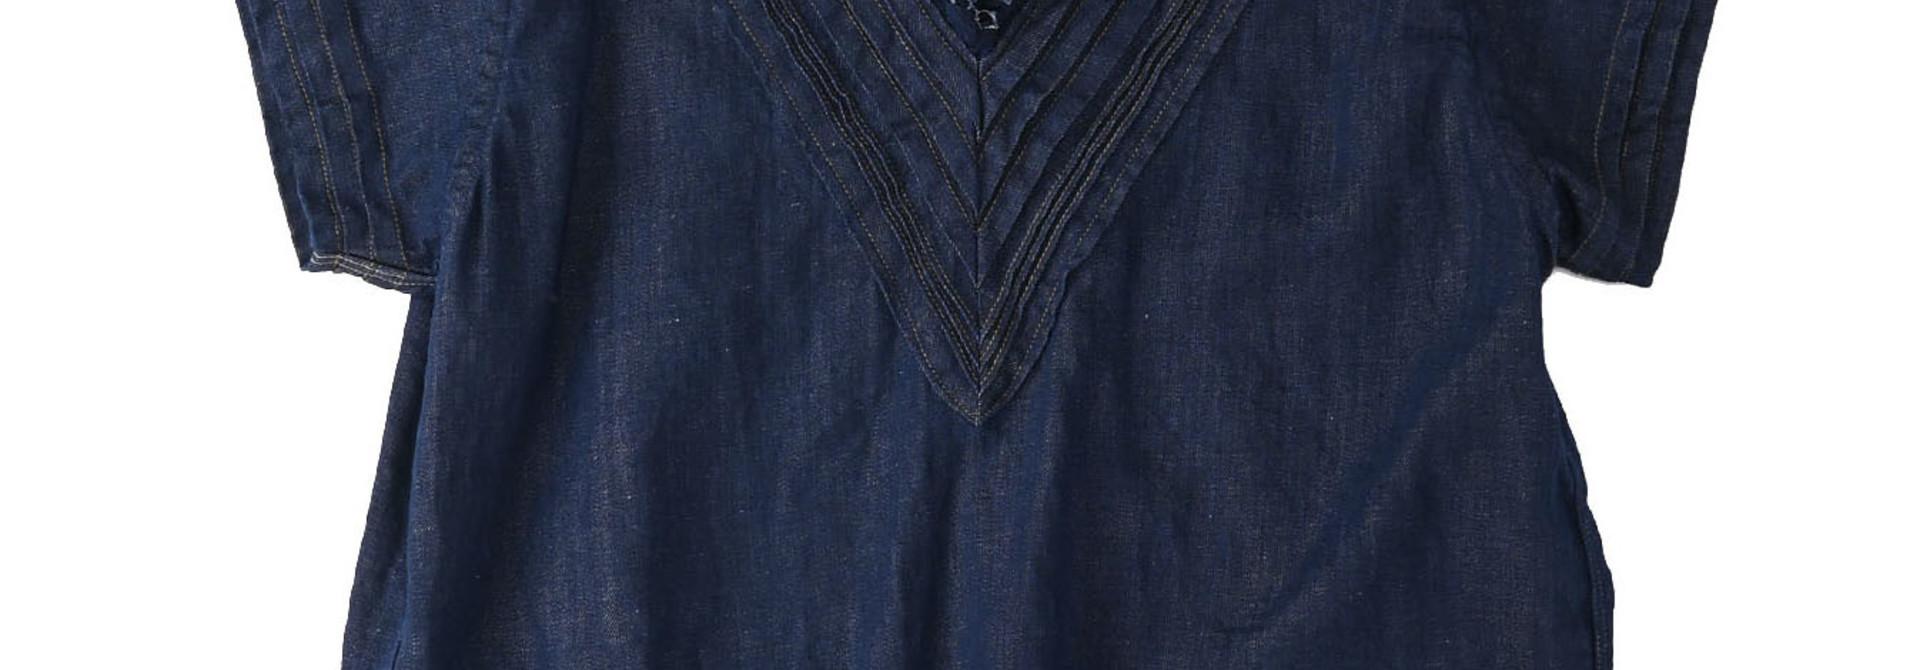 Komugi Denim Tuck Lace T-shirt